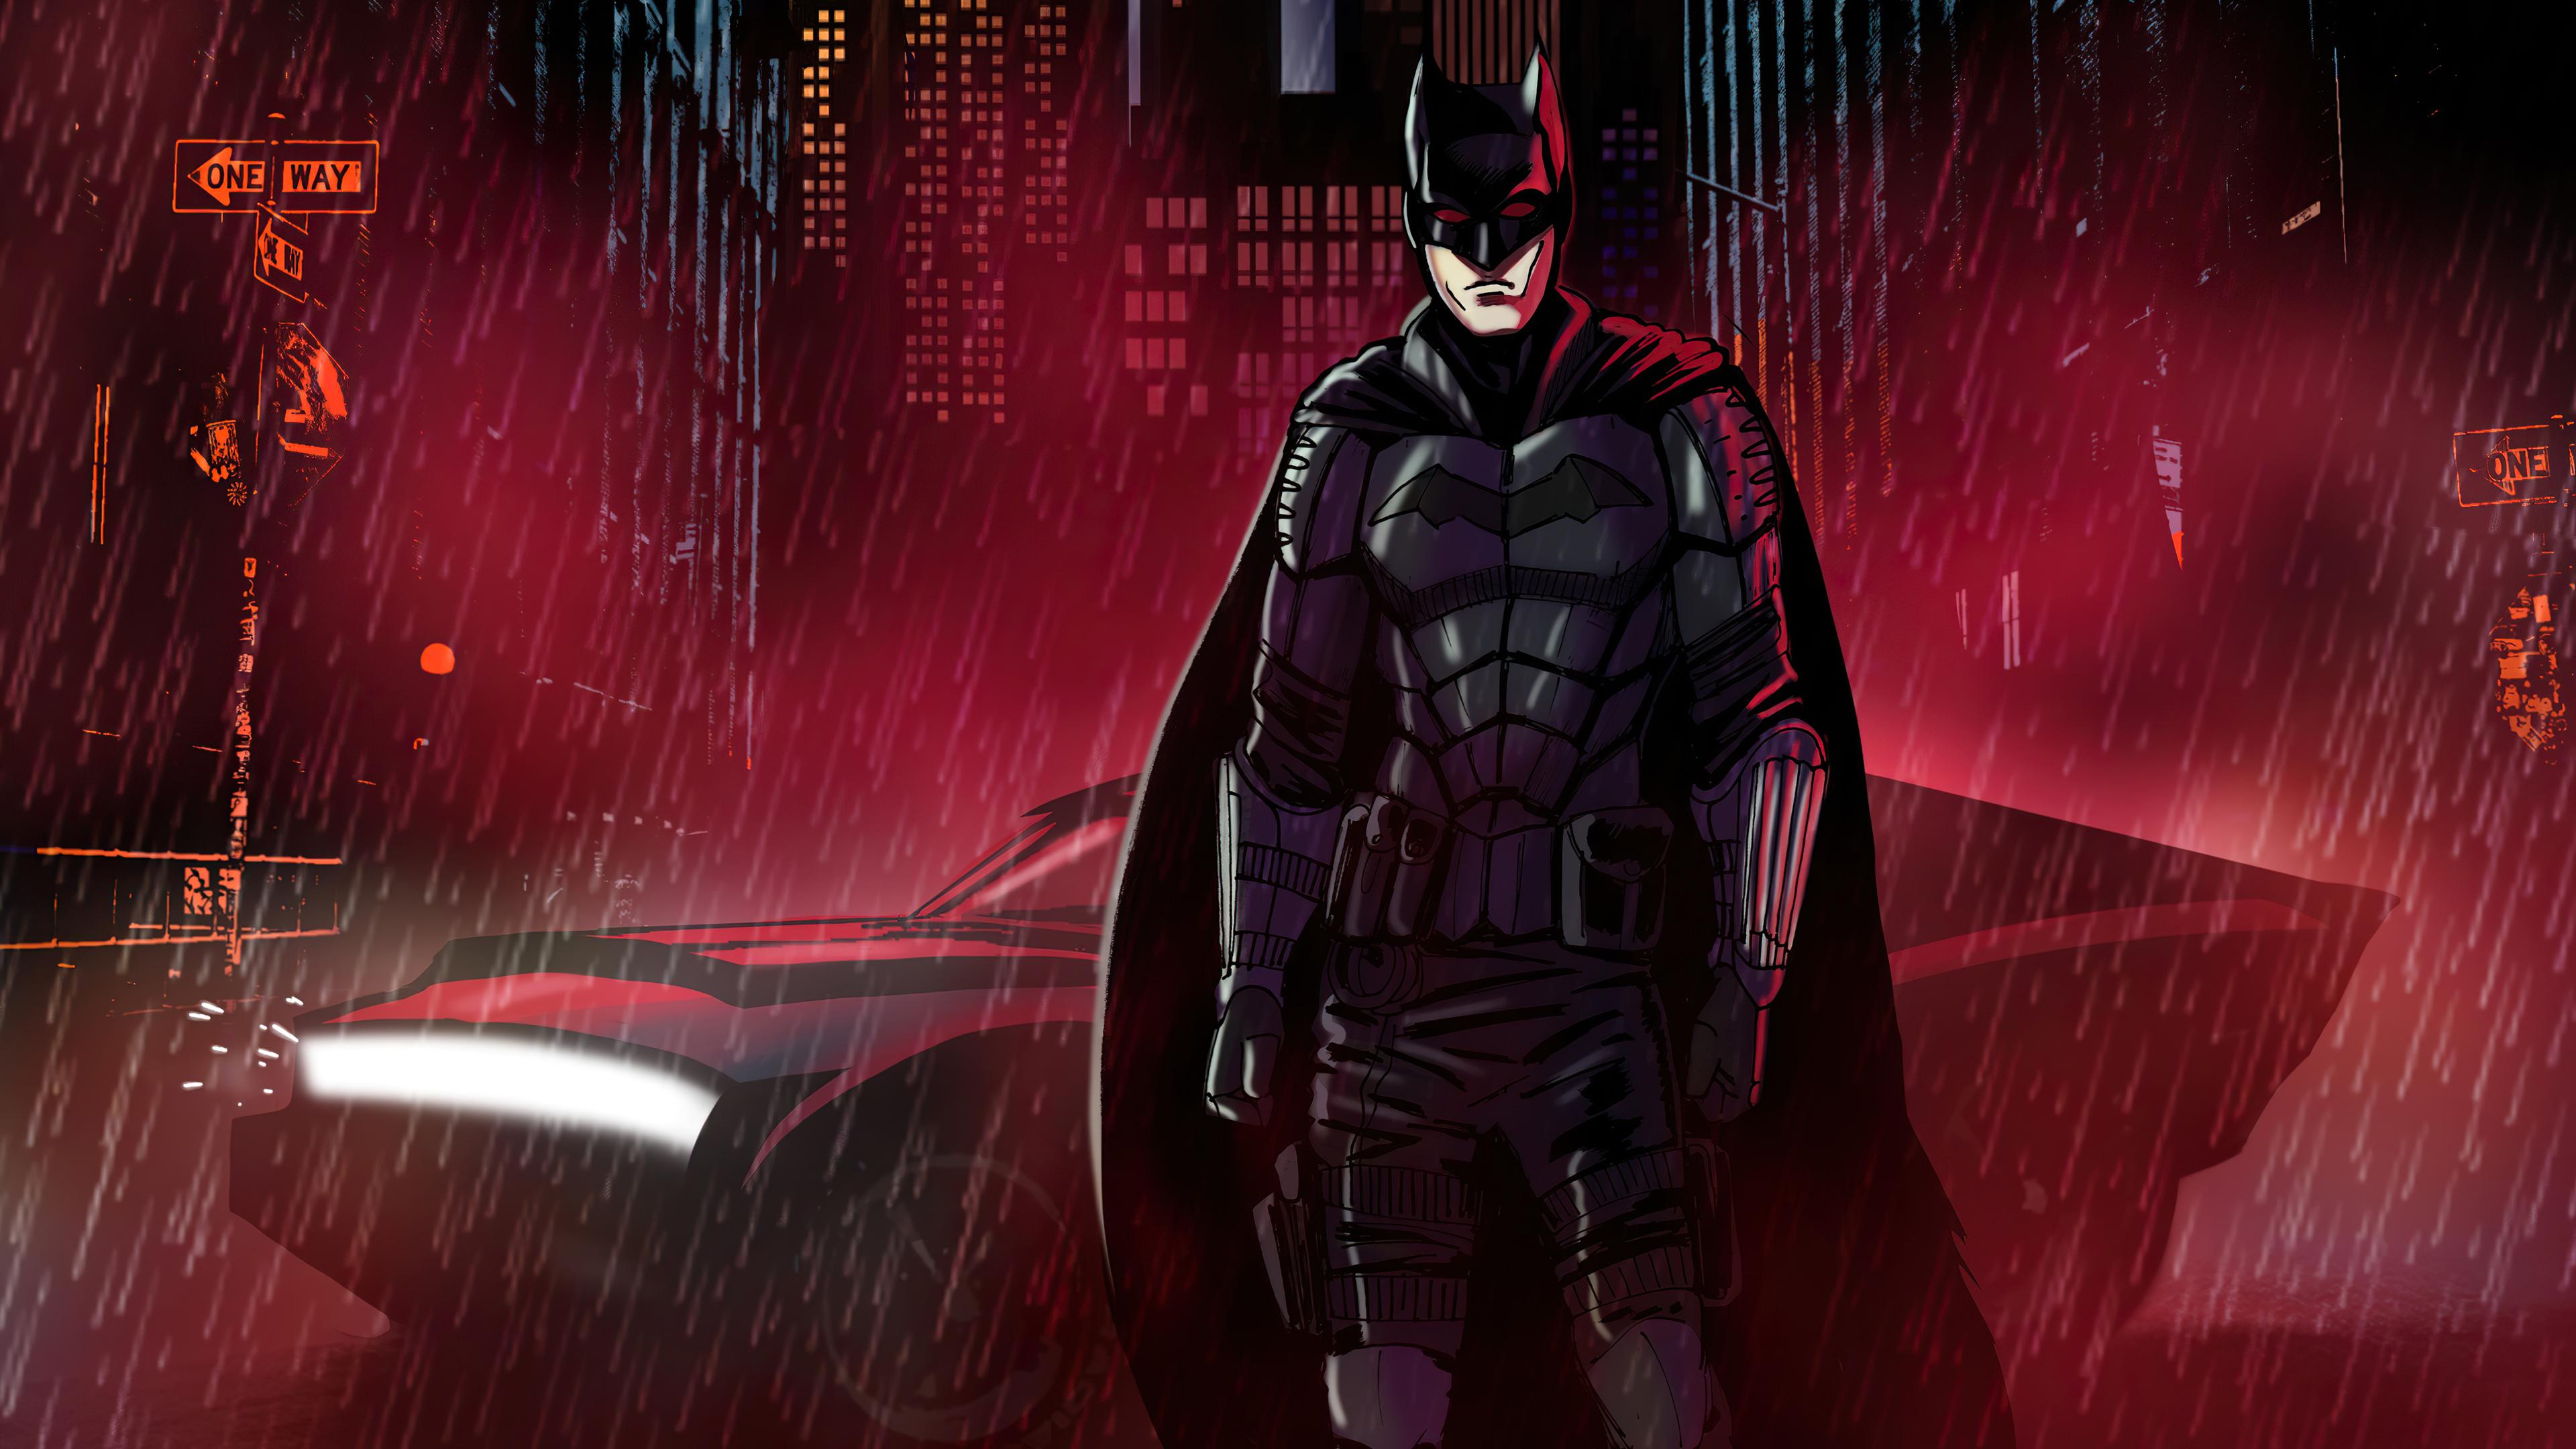 the batman night cyberpunk neon 4k 1616956946 - The Batman Night Cyberpunk Neon 4k - The Batman Night Cyberpunk Neon 4k wallpapers